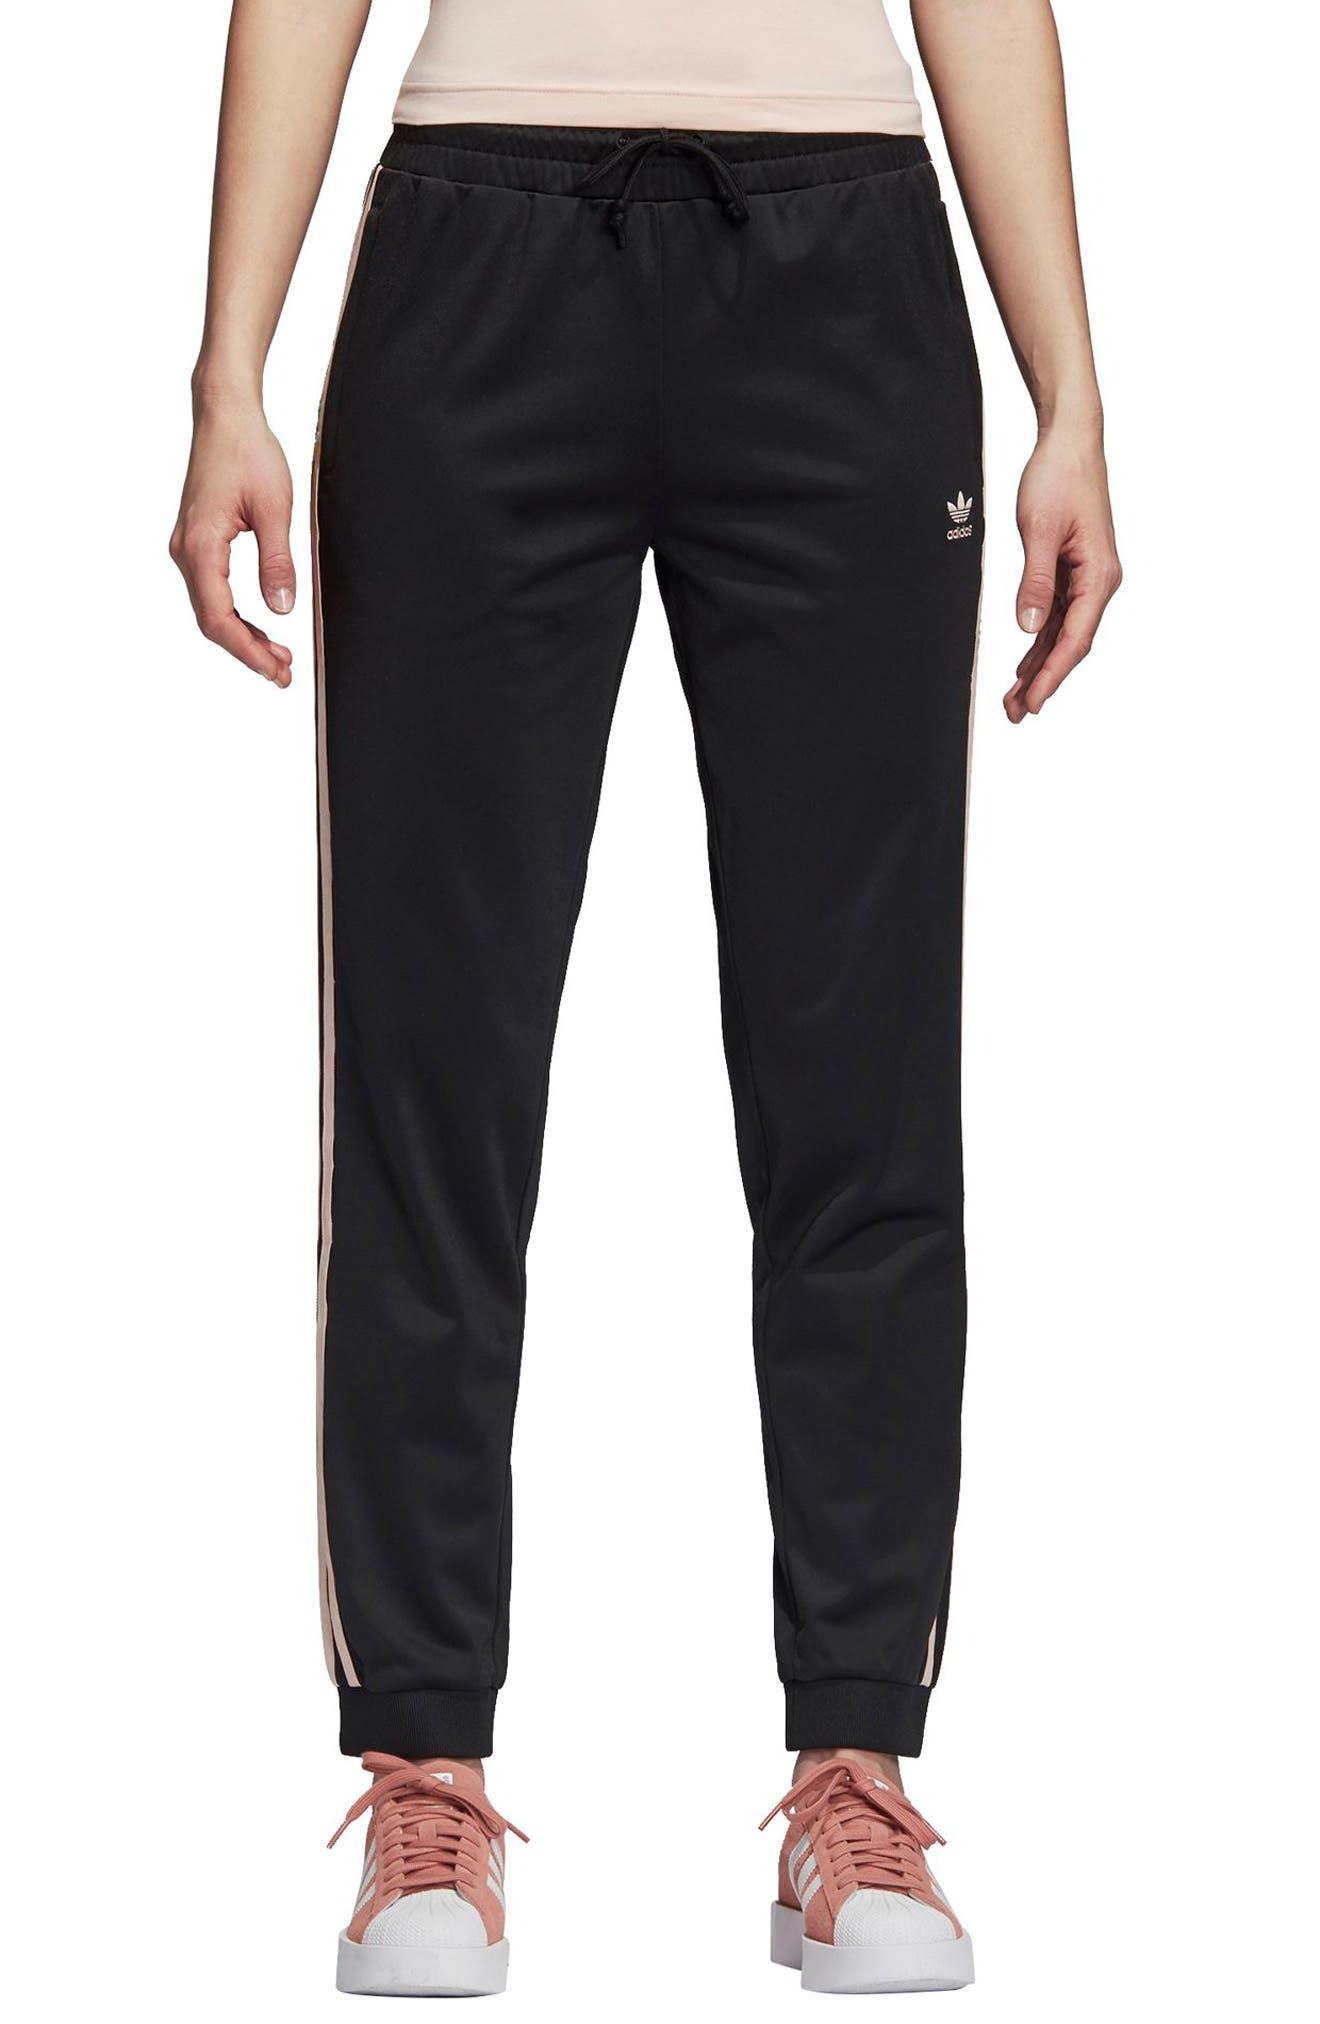 Main Image - adidas Originals Track Pants